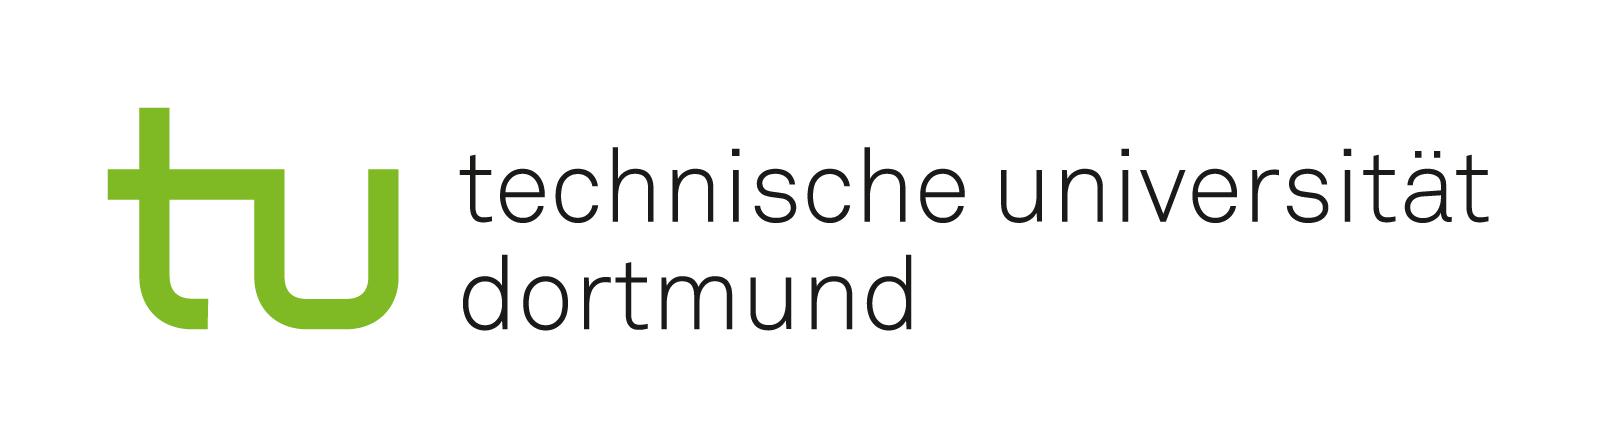 tud_logo_pantone_mit_Logo-Schutzzone_231mm(A2)